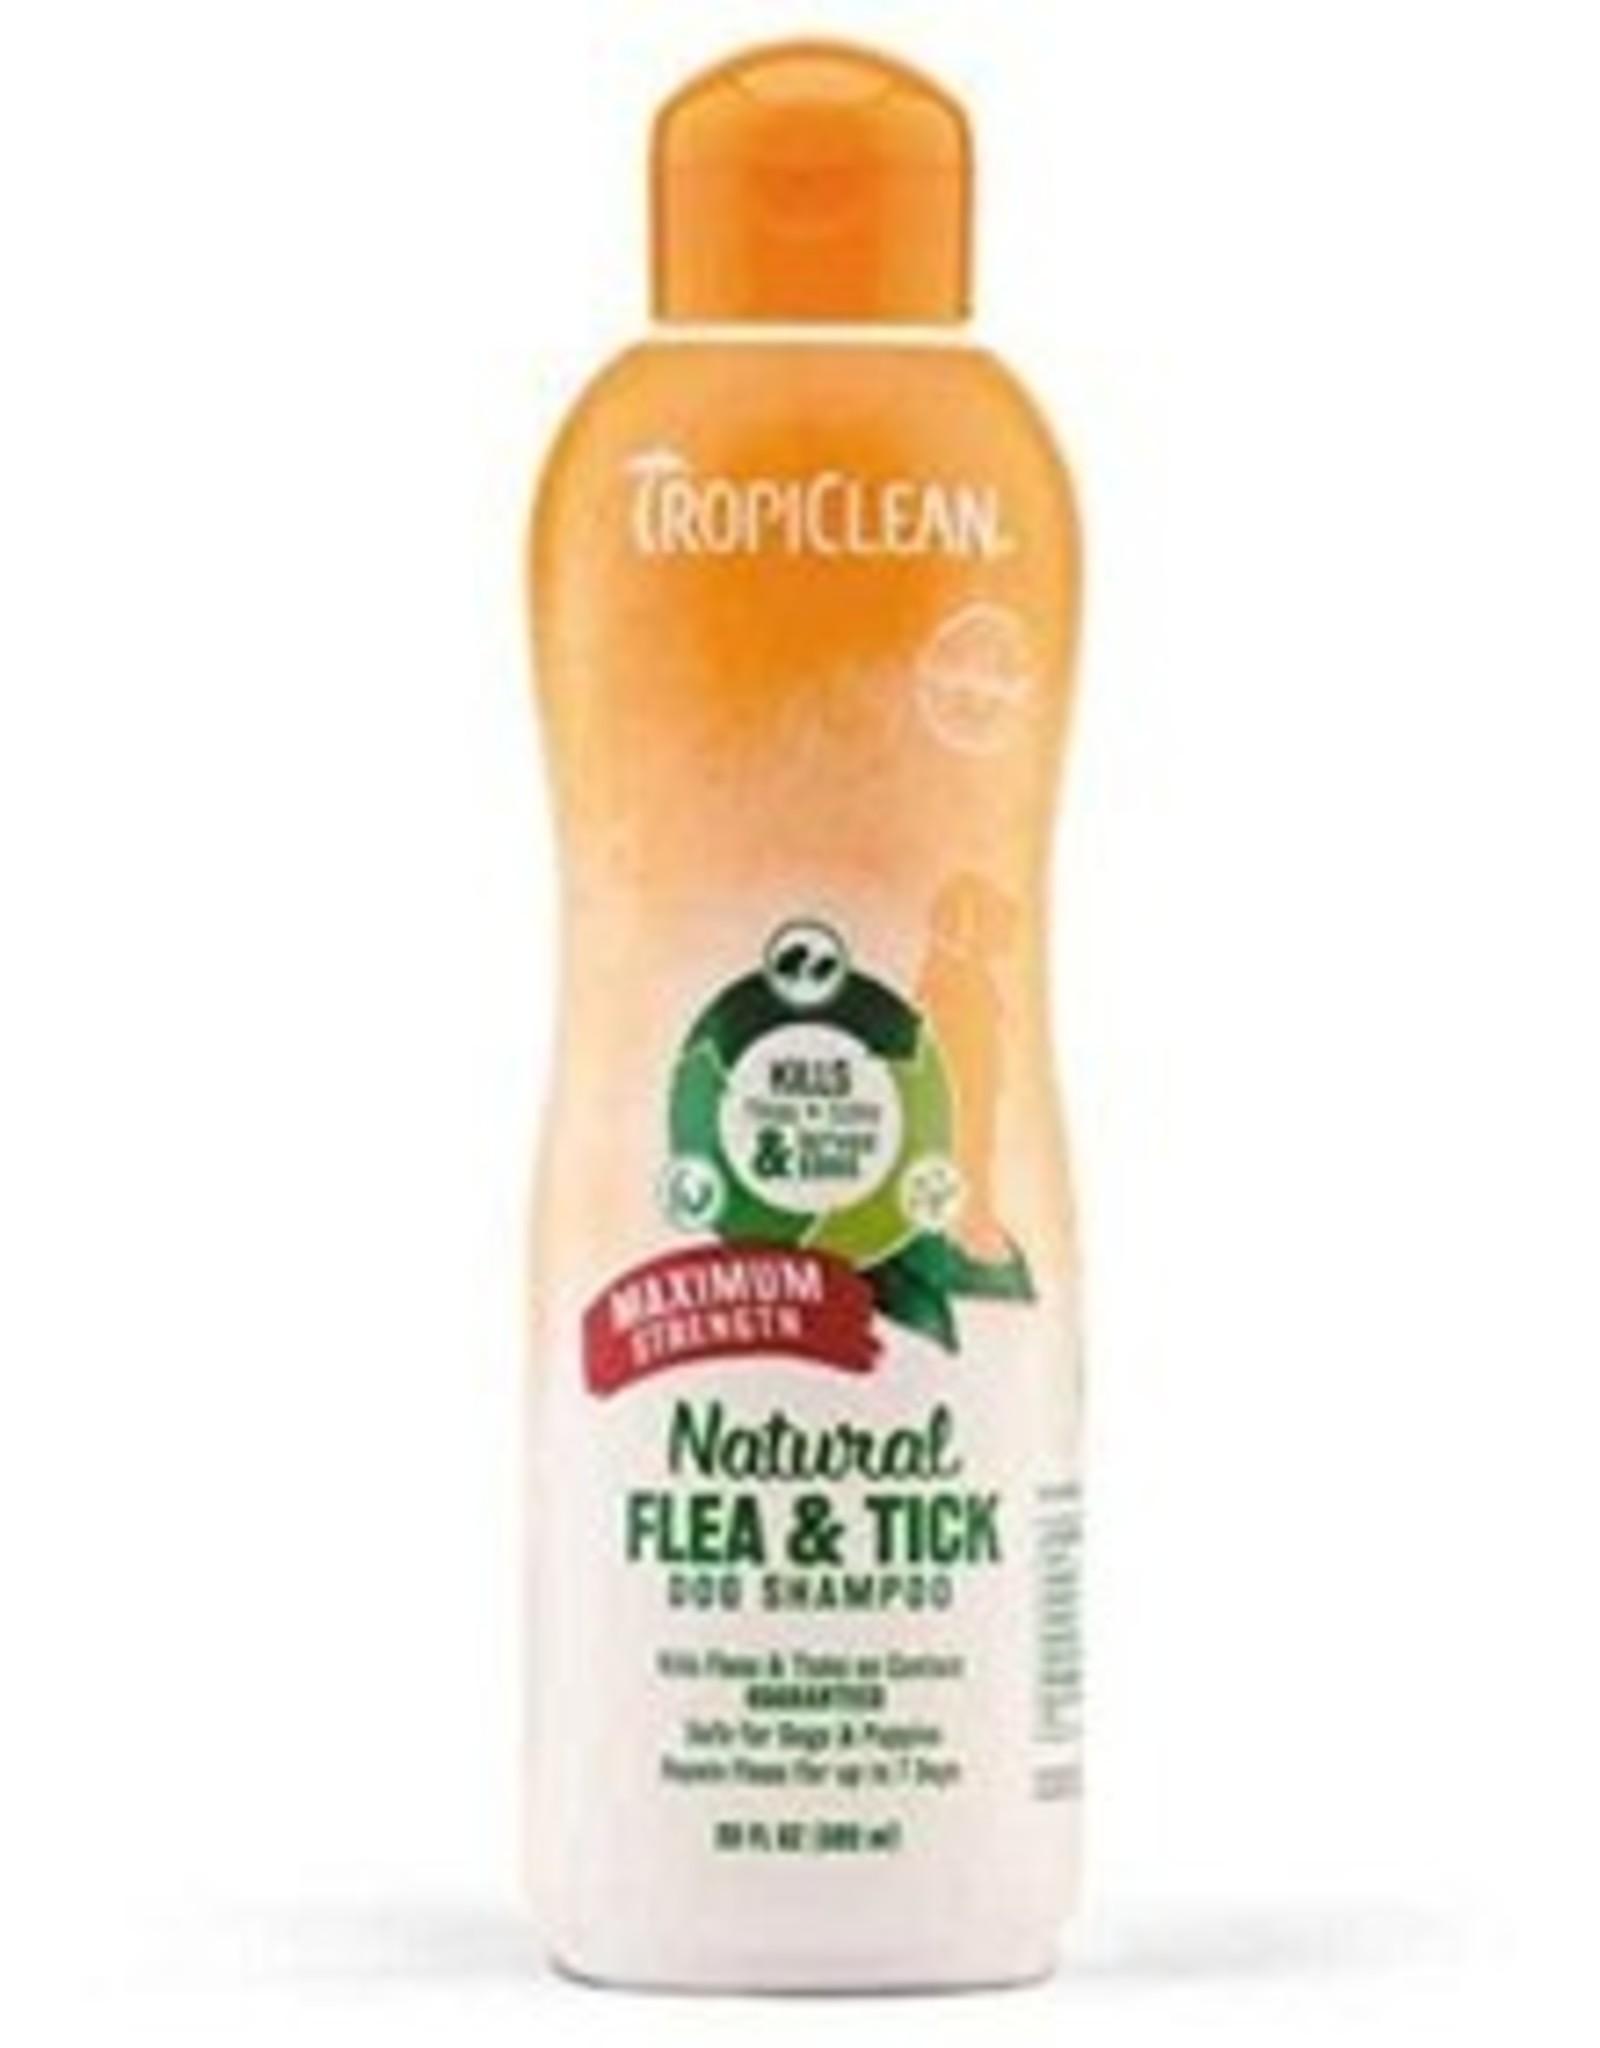 TropiClean Natural Flea Tick Shampoo plus Soothing 20z